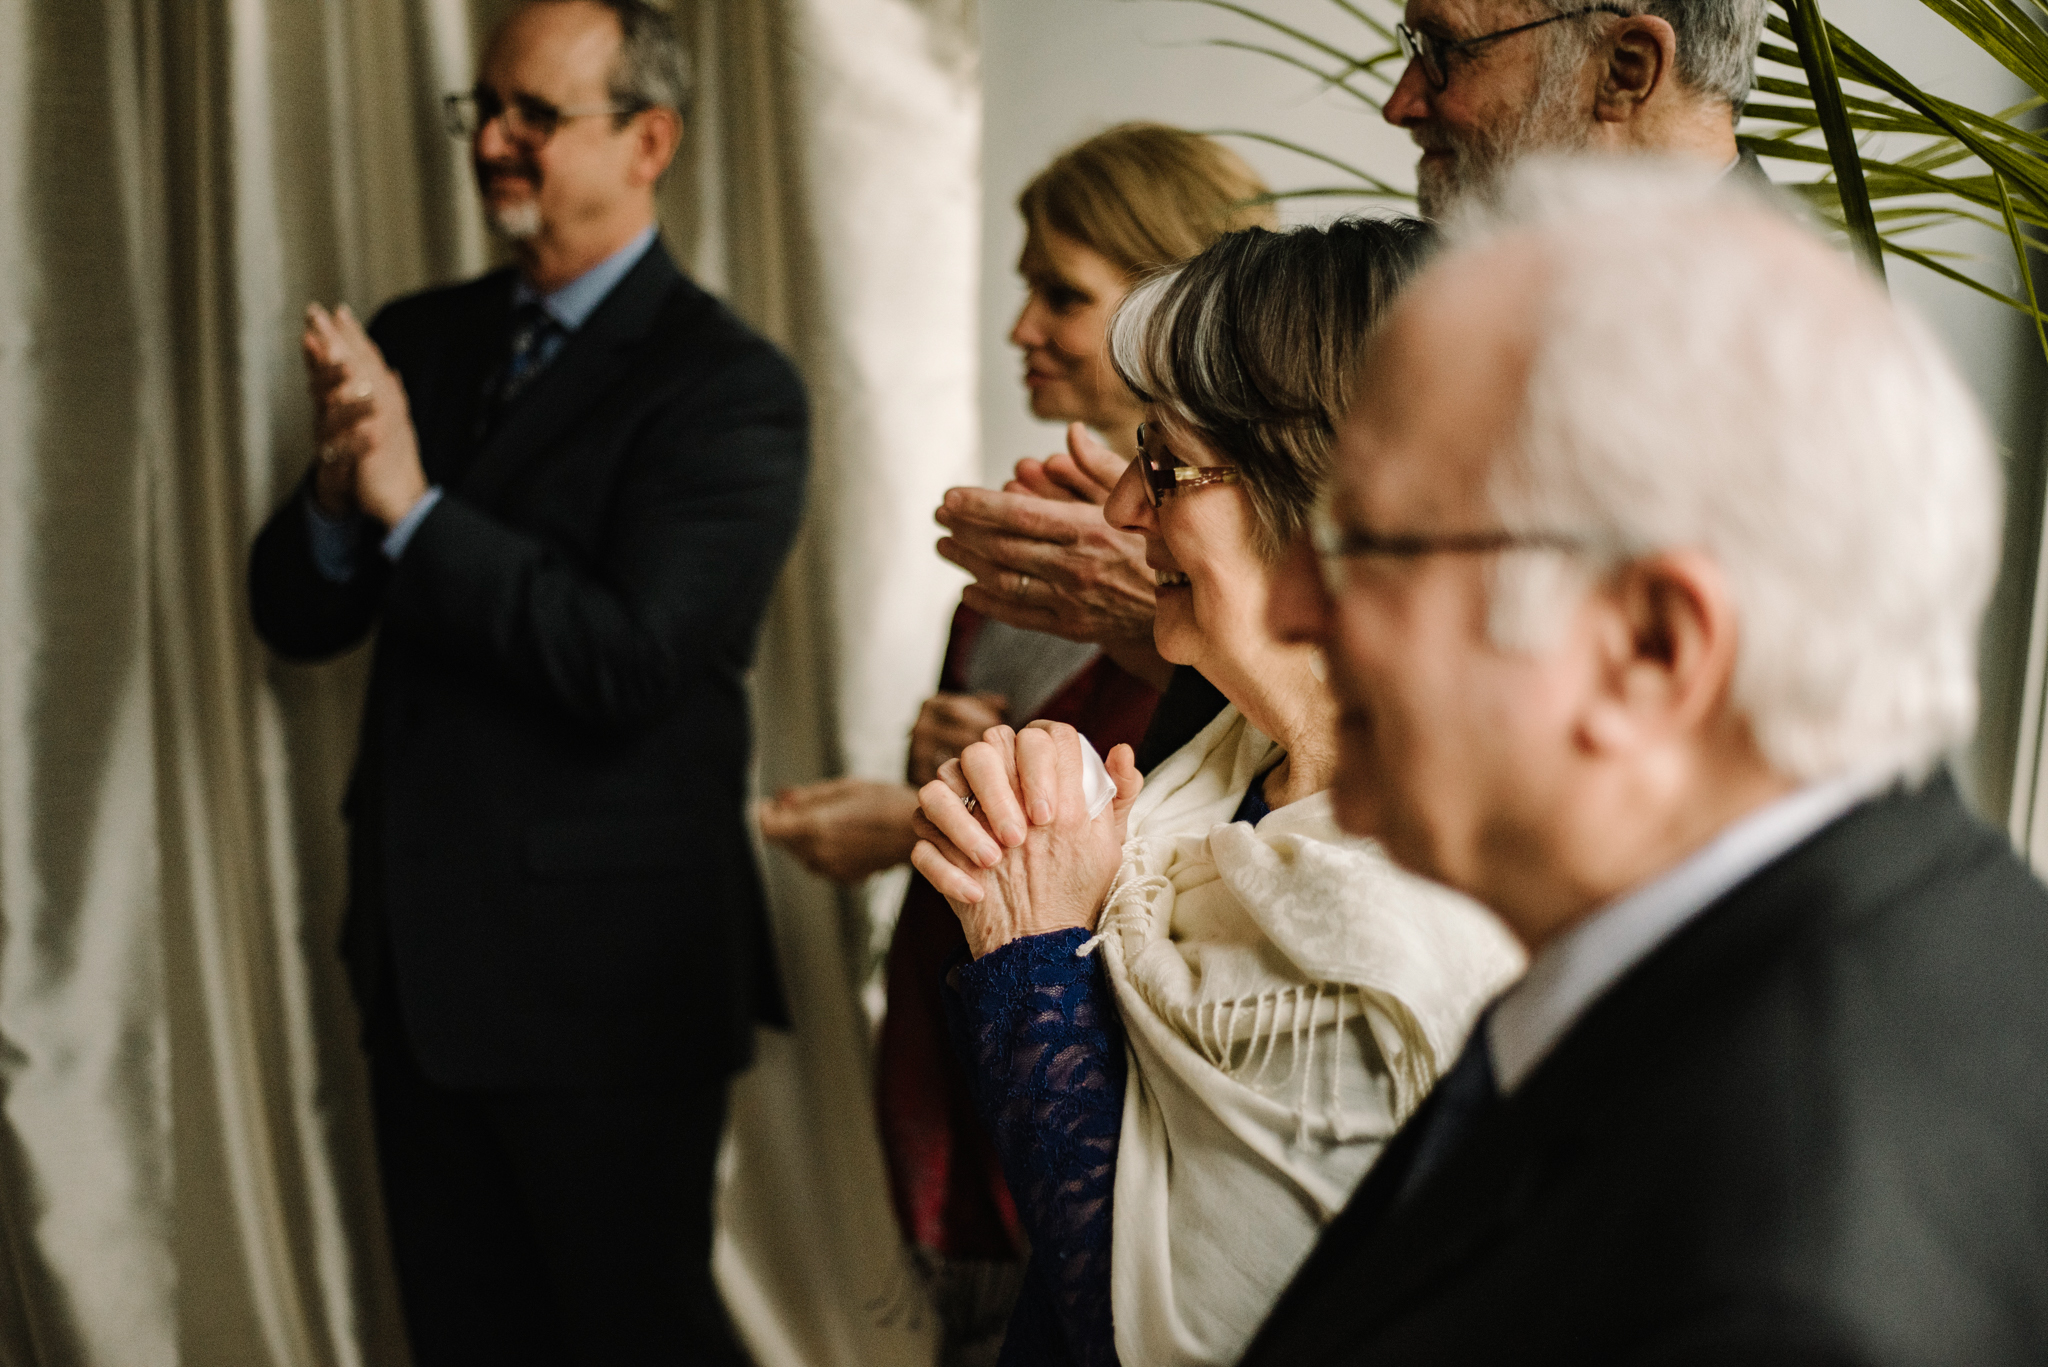 Intimate Dinner Wedding - Small Wedding with Candlelit Dinner - Sperryville Virginia Wedding - Backyard Wedding - Flourish Root Wedding Flowers - White Sails Creative Wedding - Cozy Wedding - Casual Wedding - Intimate Wedding_28.jpg